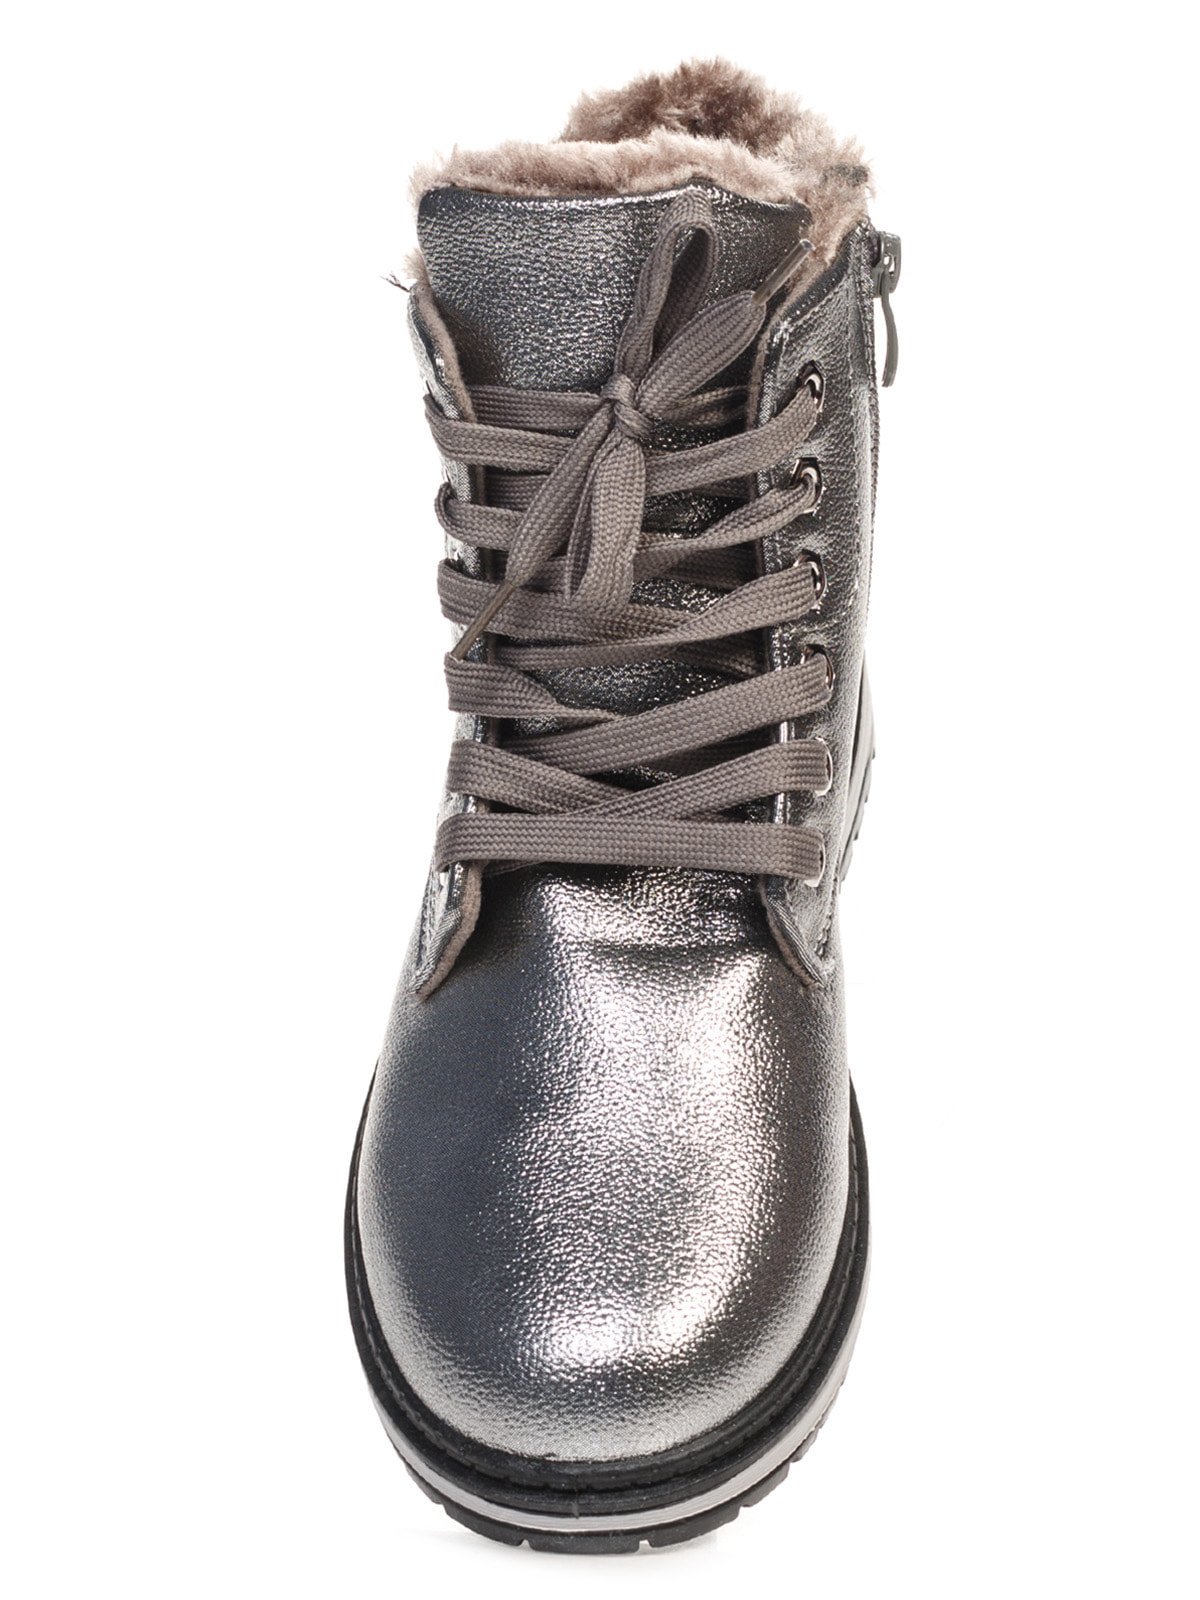 Ботинки серебристые   4663775   фото 4